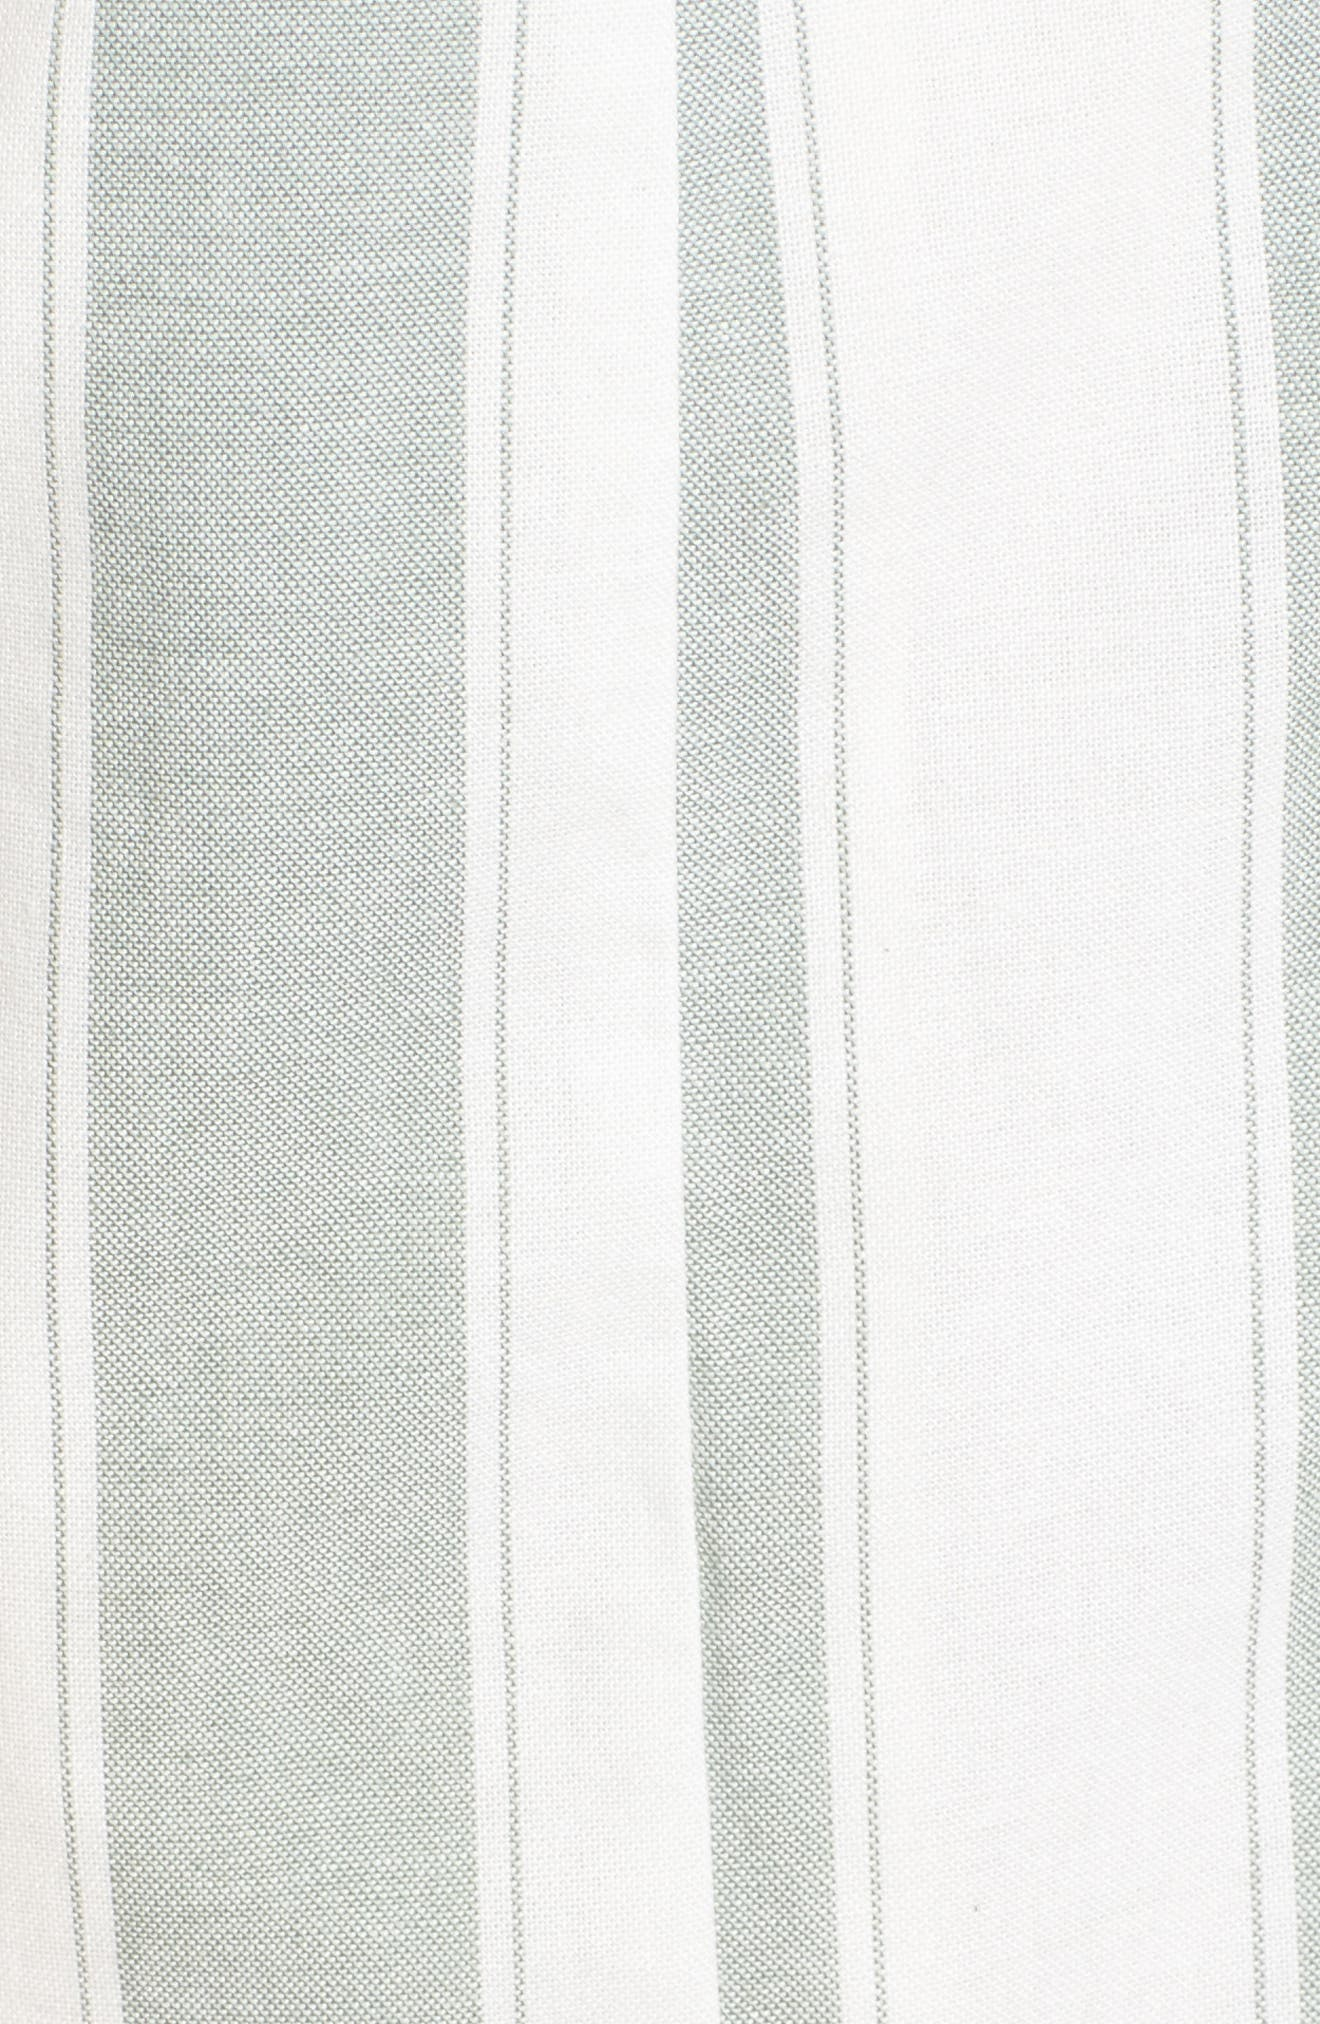 Poetic Stripe Sundress,                             Alternate thumbnail 6, color,                             Sage W White